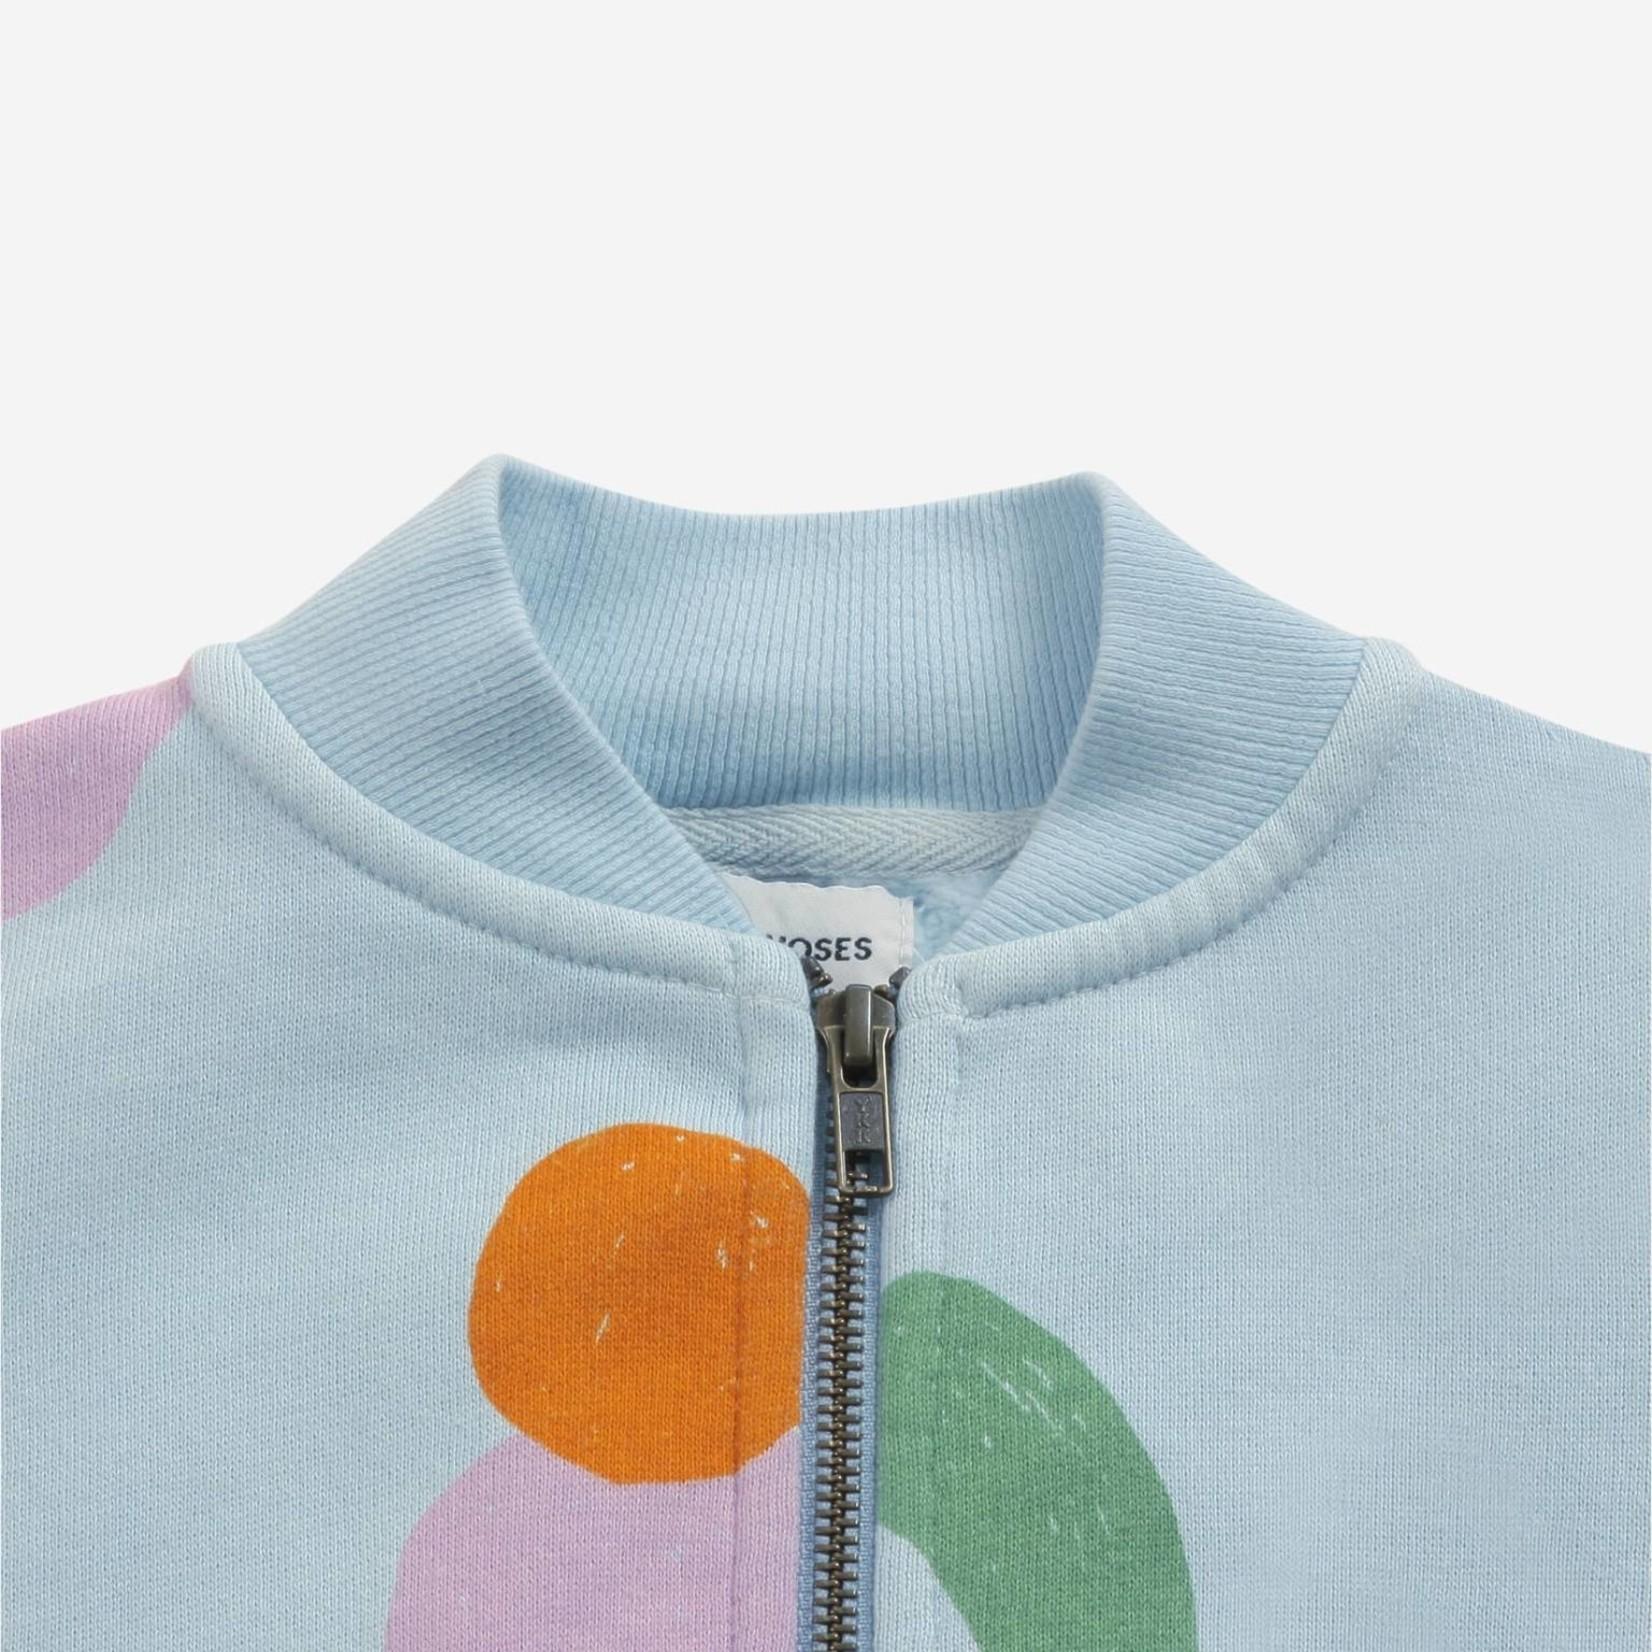 BOBO CHOSES BOBO CHOSES Fruits All Over zipped sweatshirt